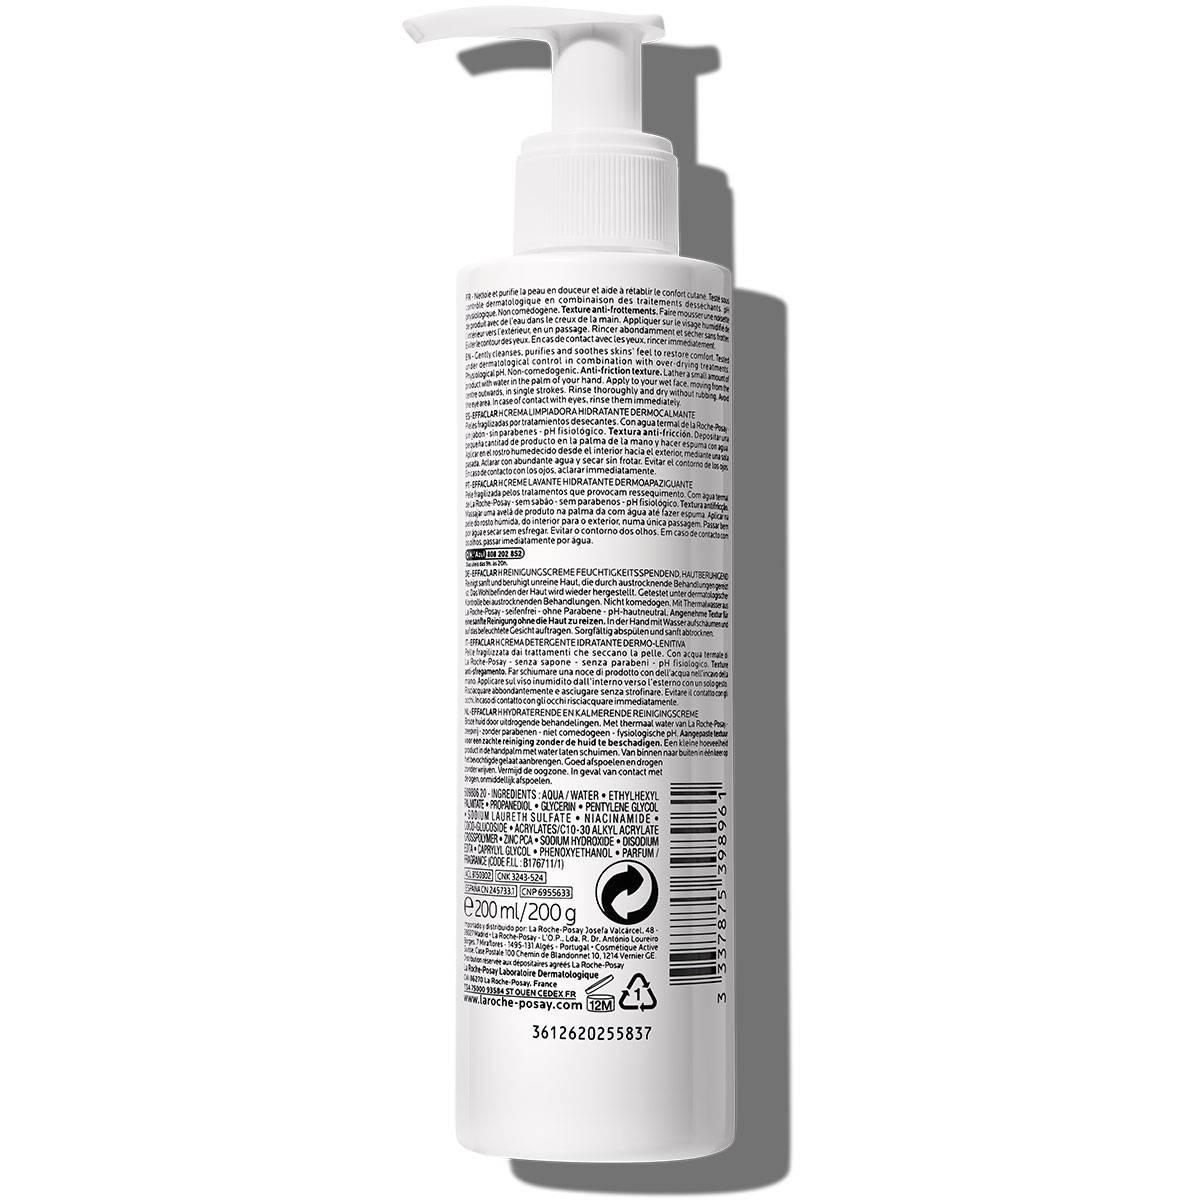 La Roche Posay Ansiktsrengöring Effaclar H Cleansing Cream 200ml 33378753